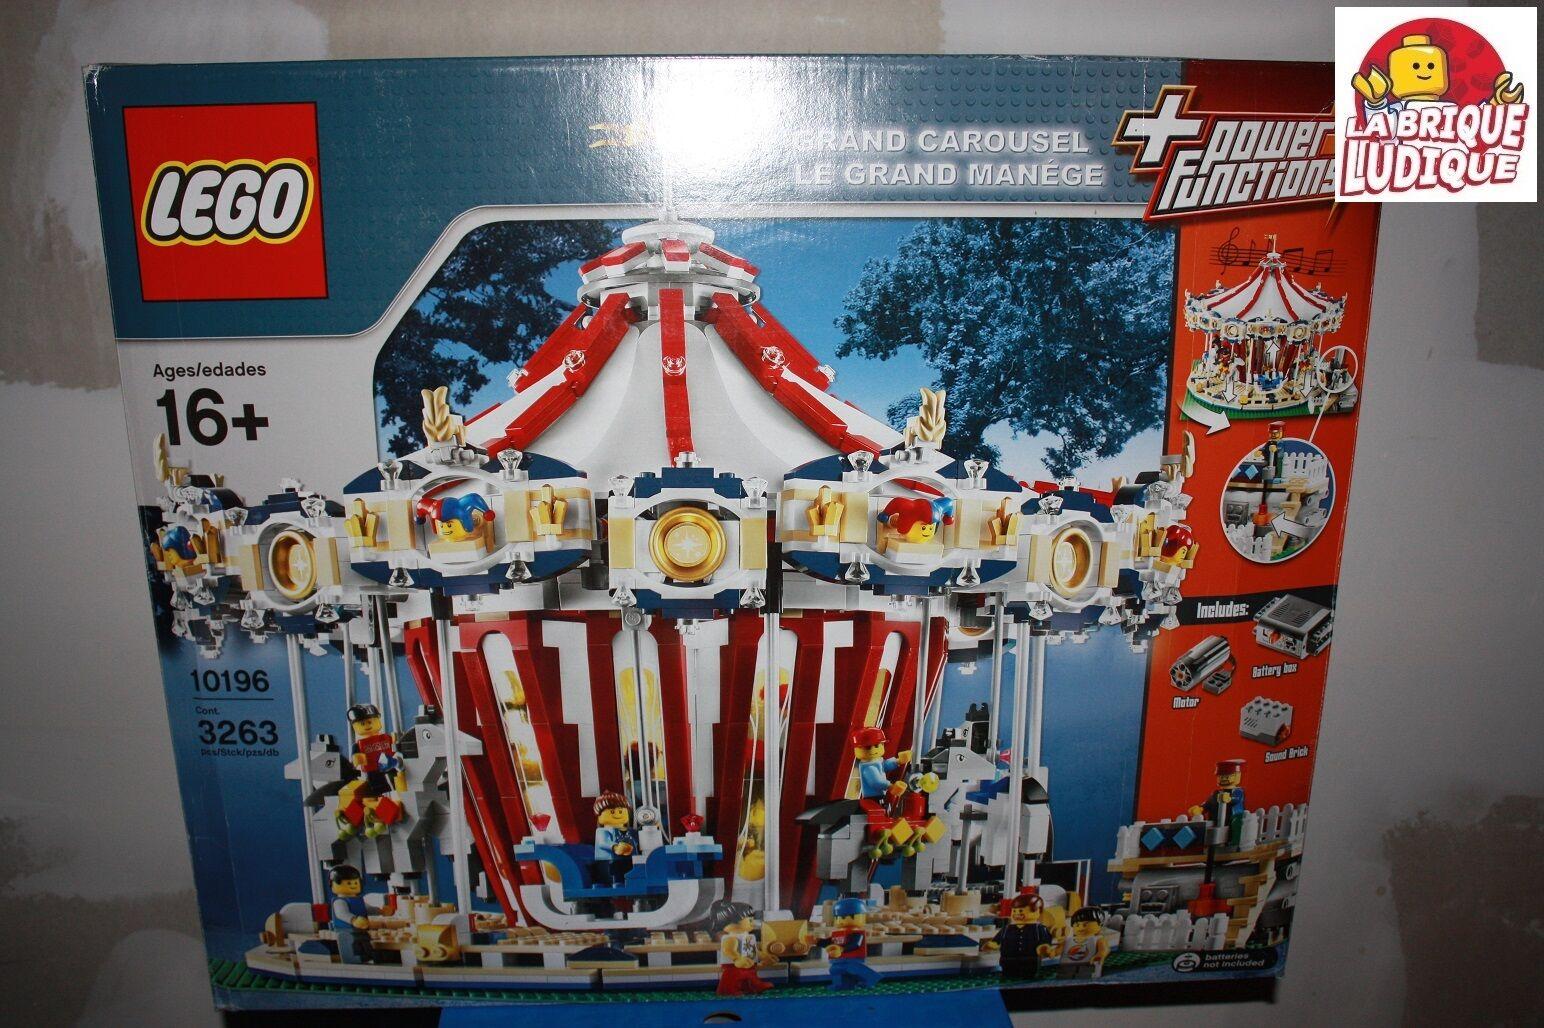 Lego - boite grand carousel carrousel manège rare collector 10196 NEUF